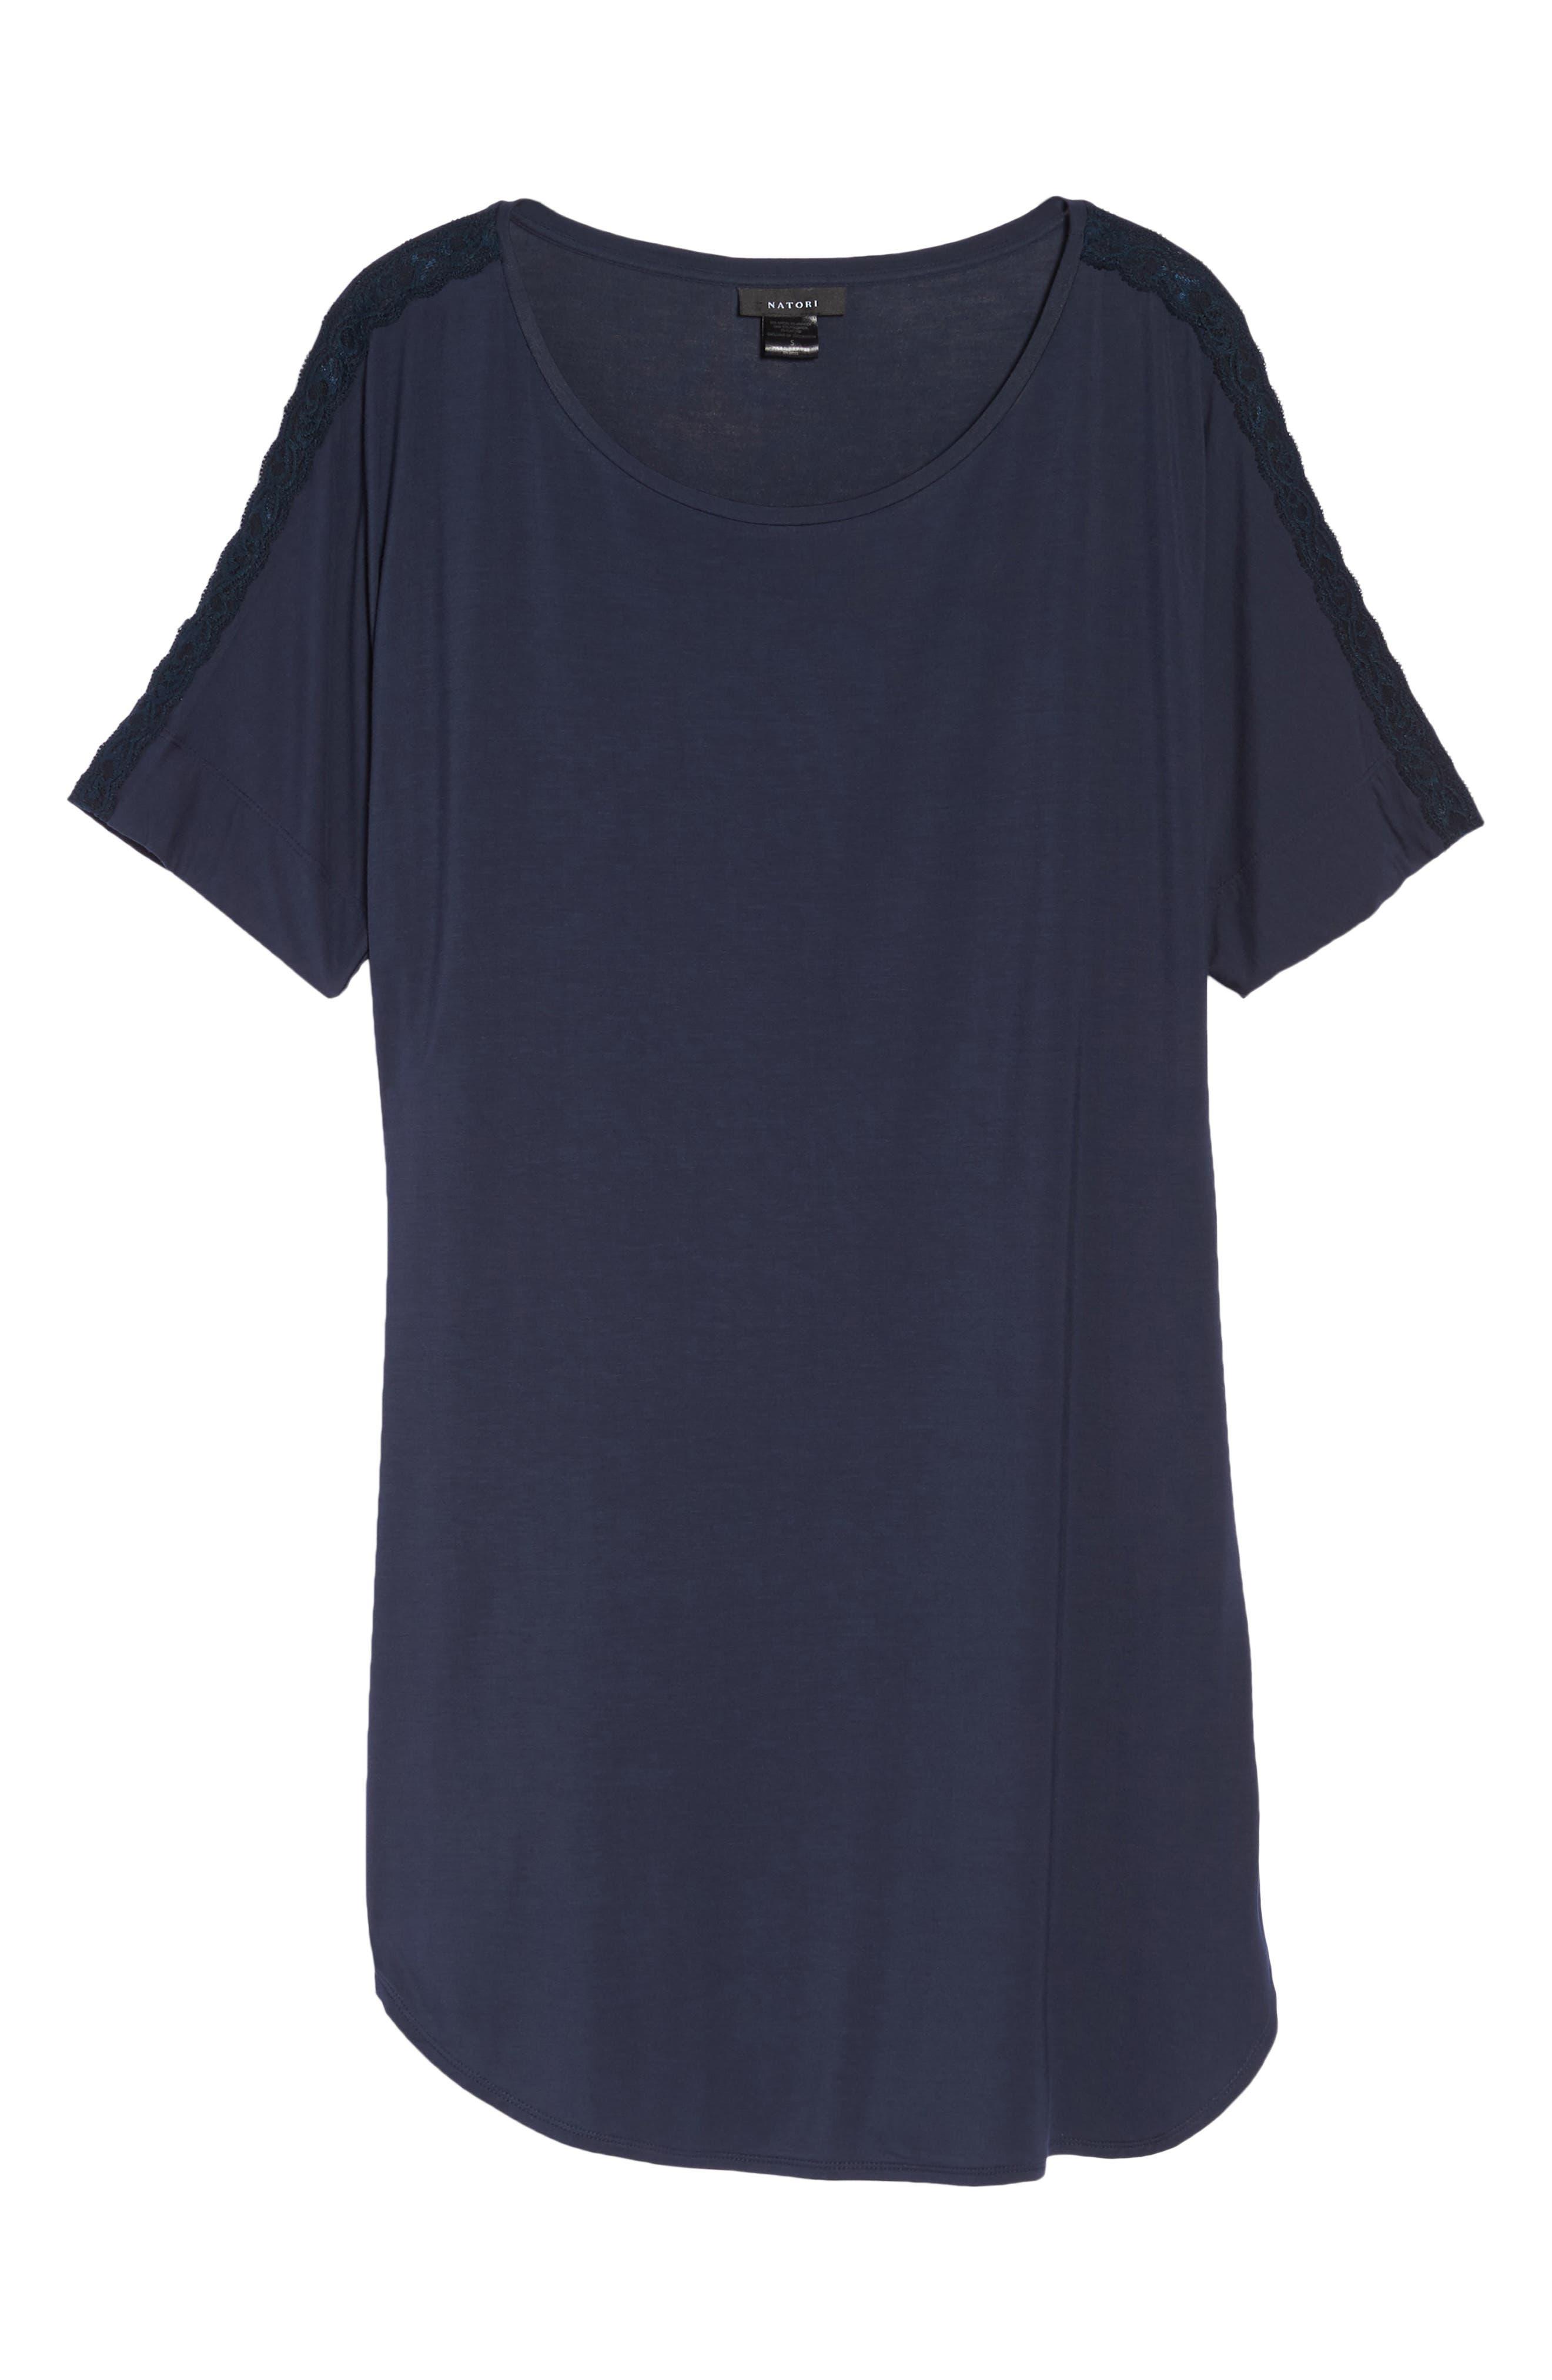 Feathers Essential Sleep Shirt,                             Alternate thumbnail 6, color,                             Night Blue